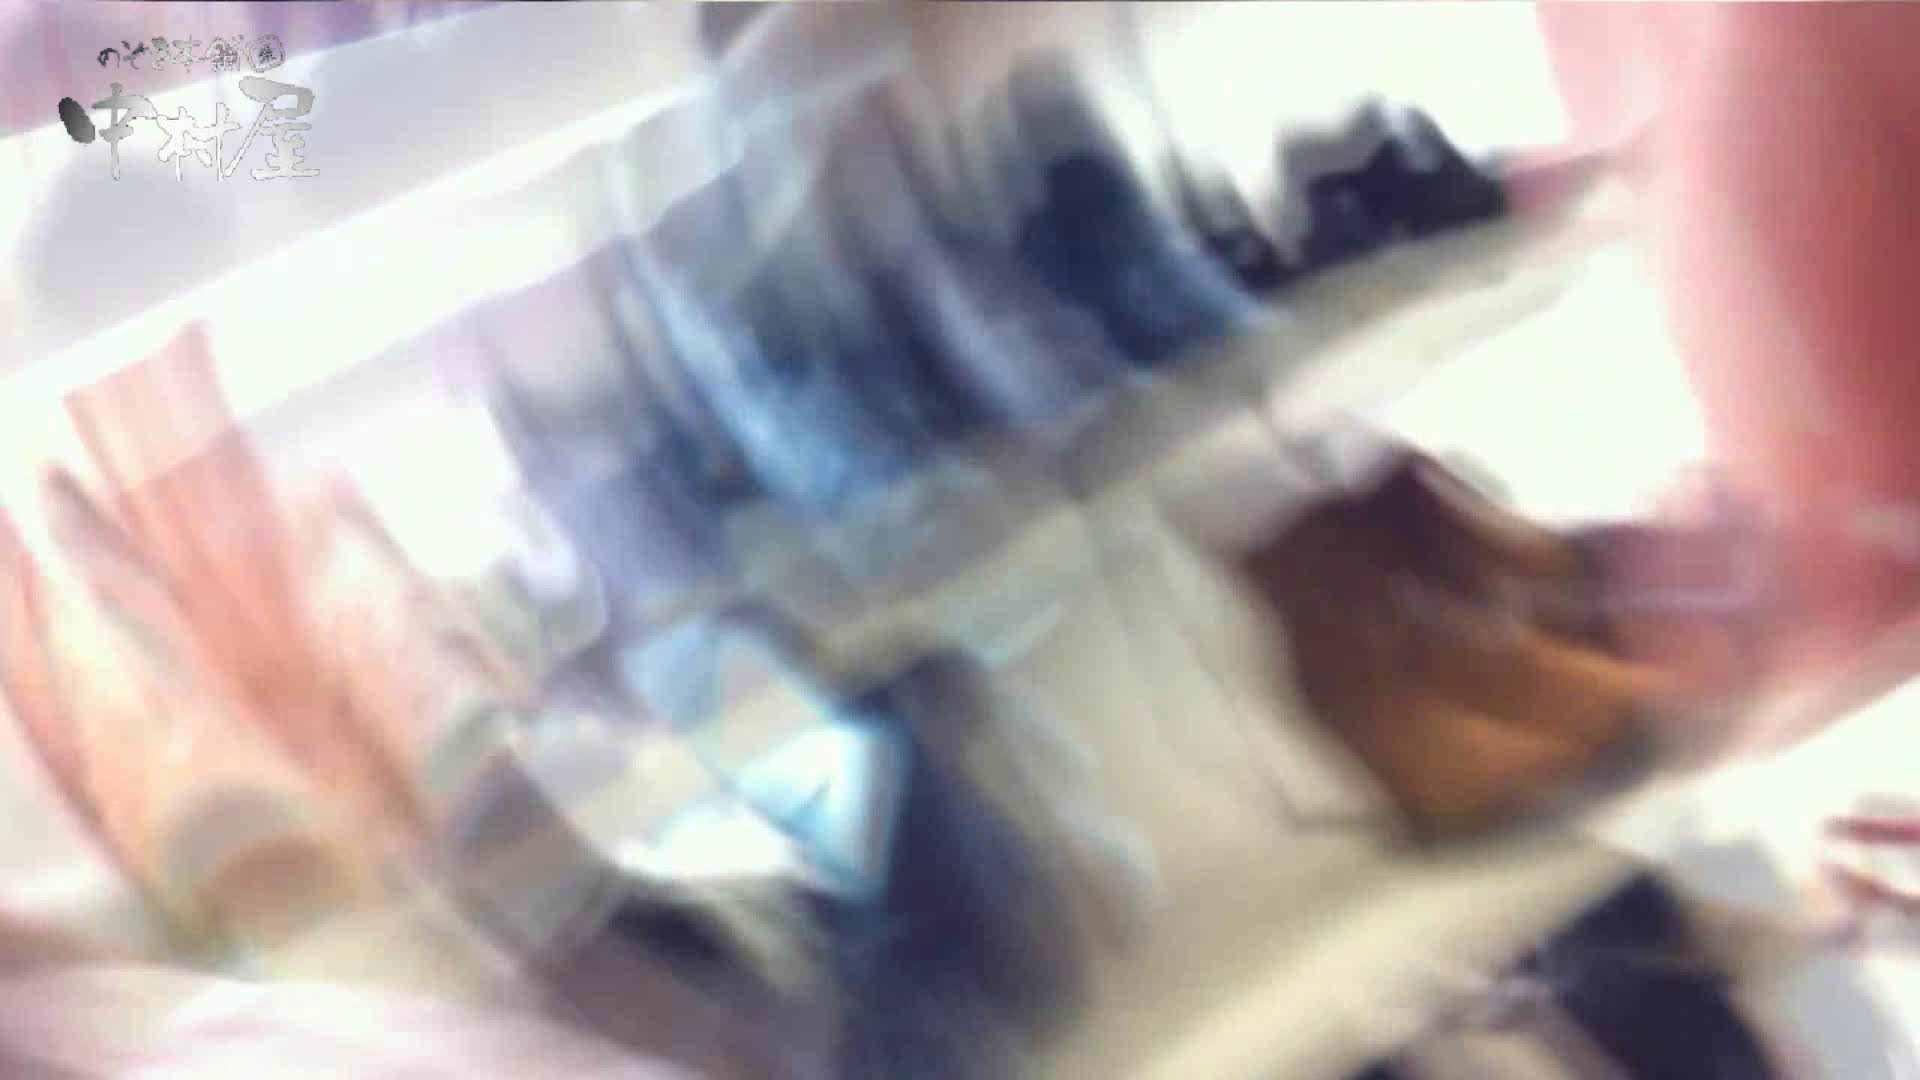 vol.45 可愛いカリスマ店員限定‼胸チラ&パンチラ 食い込みミッキーマウス! おまんこ のぞき動画画像 103画像 40